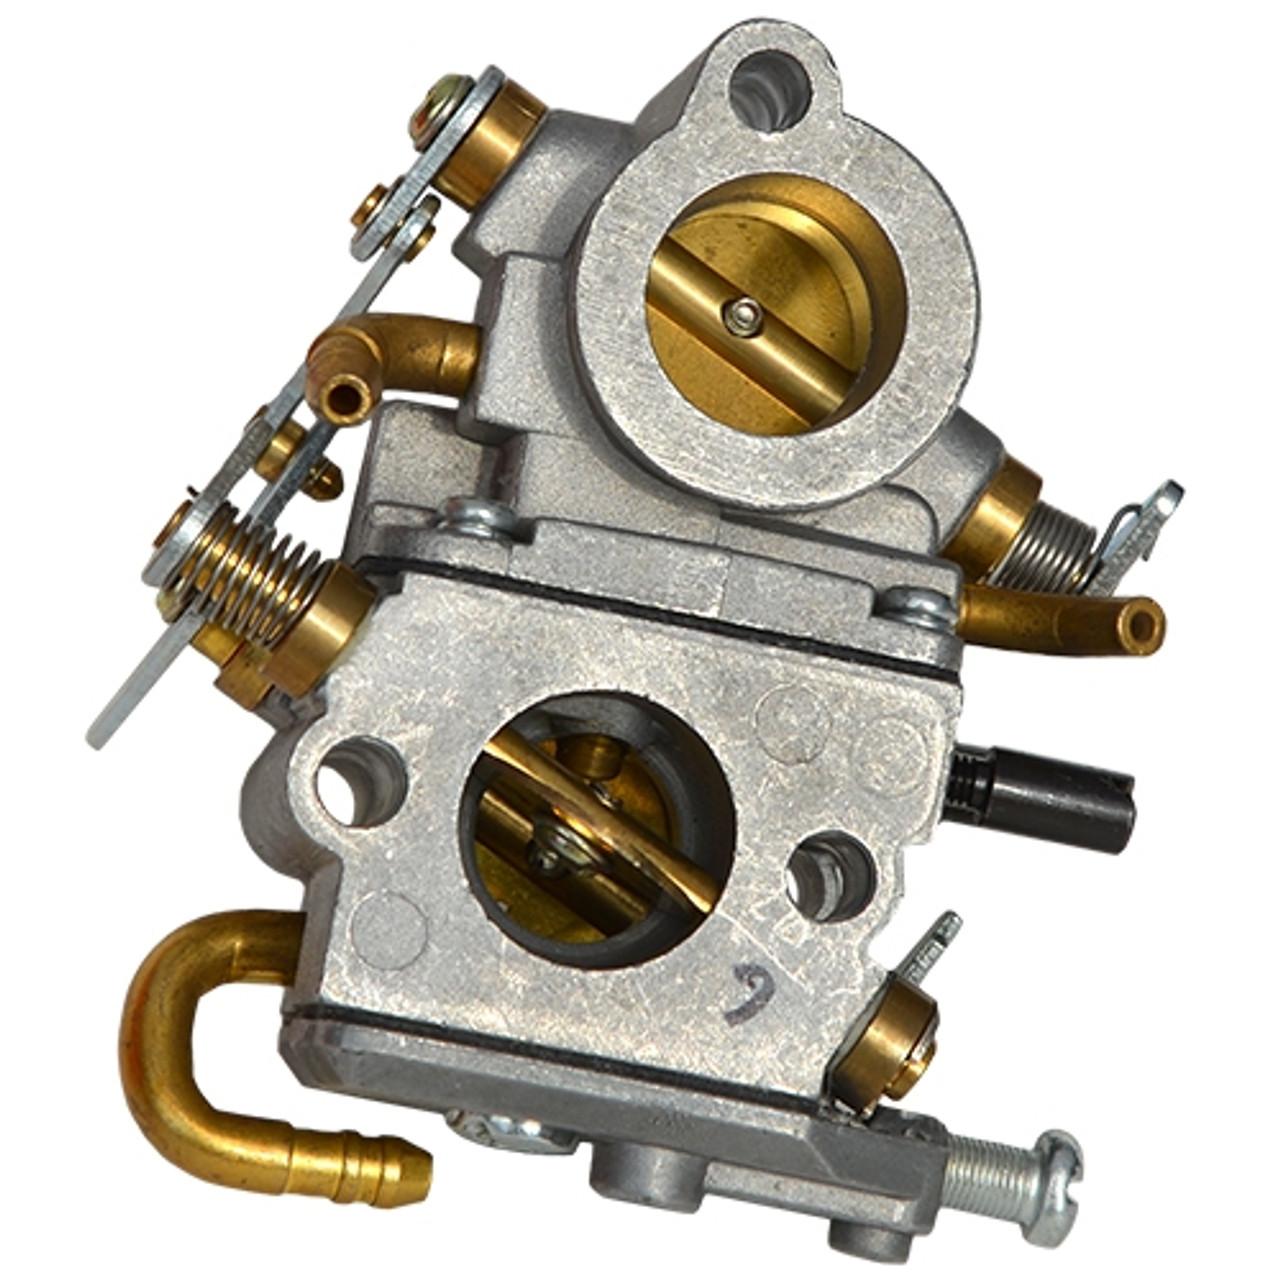 Stihl Ts 410, Ts 420 Carburetor Replaces Zama C1Q-S118 4238 120 0600